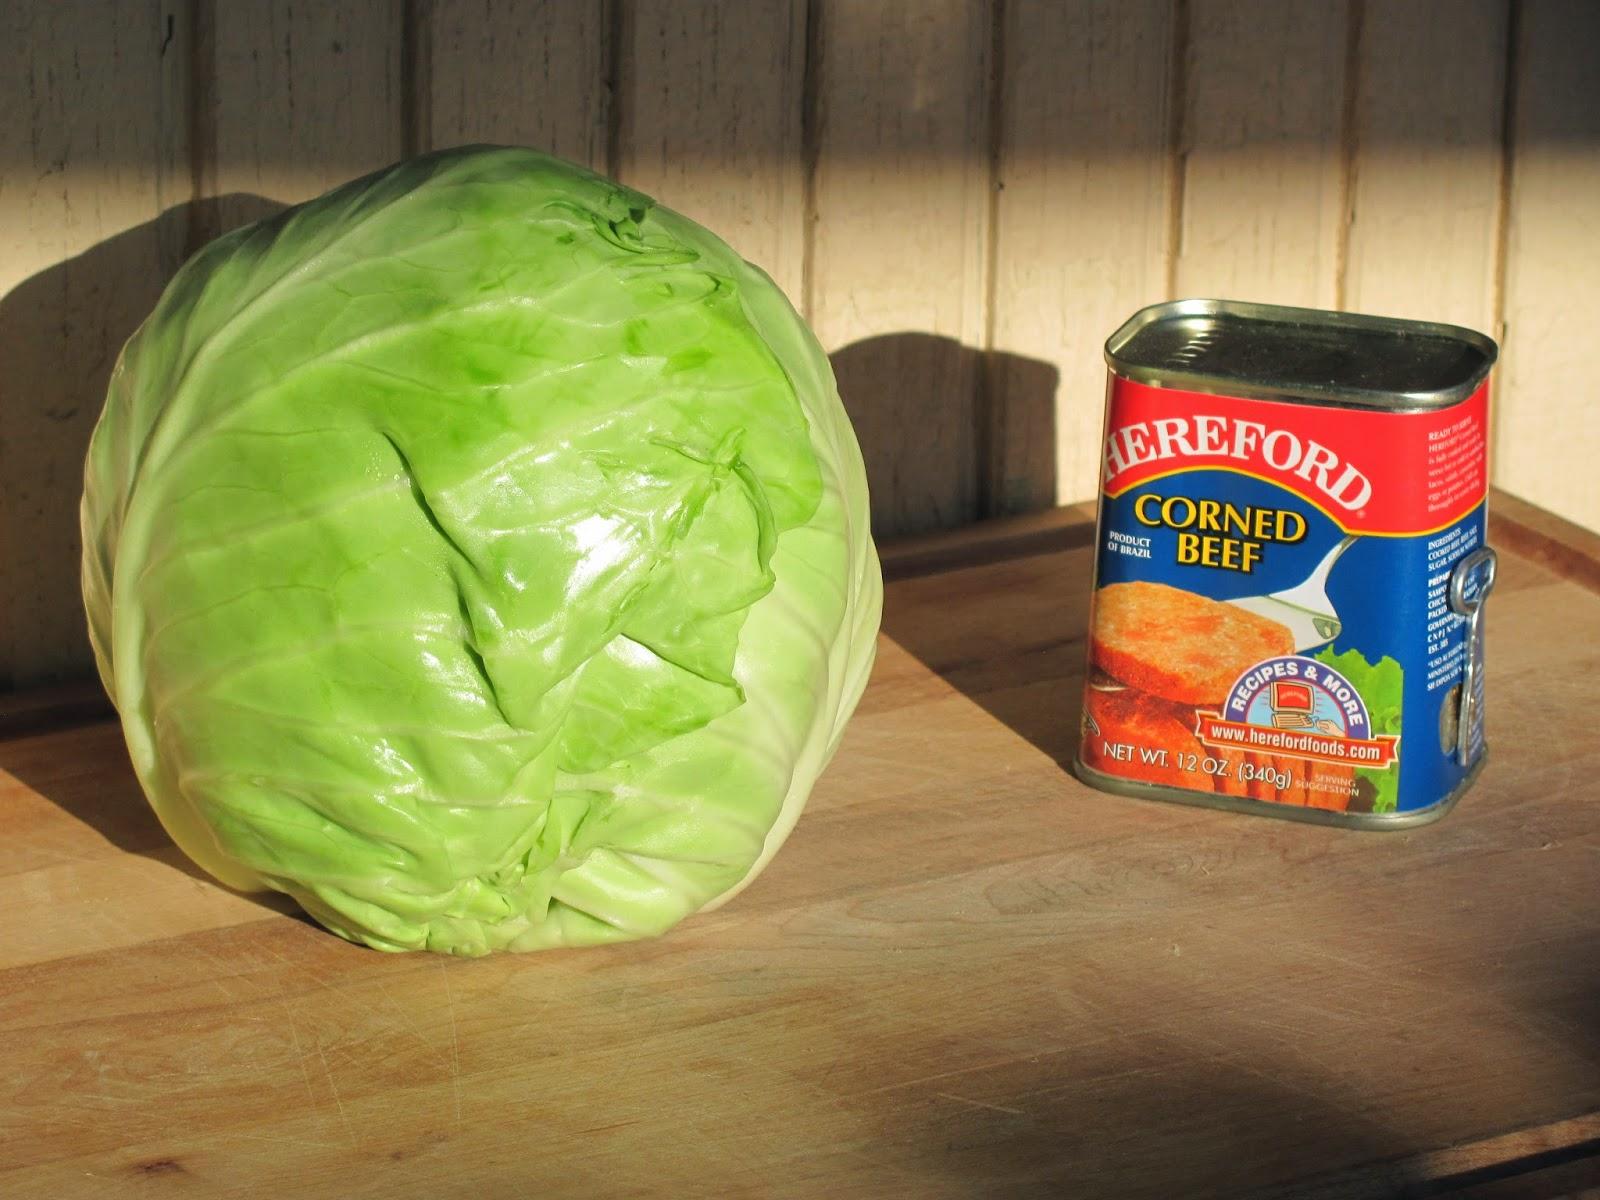 how to cook frozen corned beef in oven